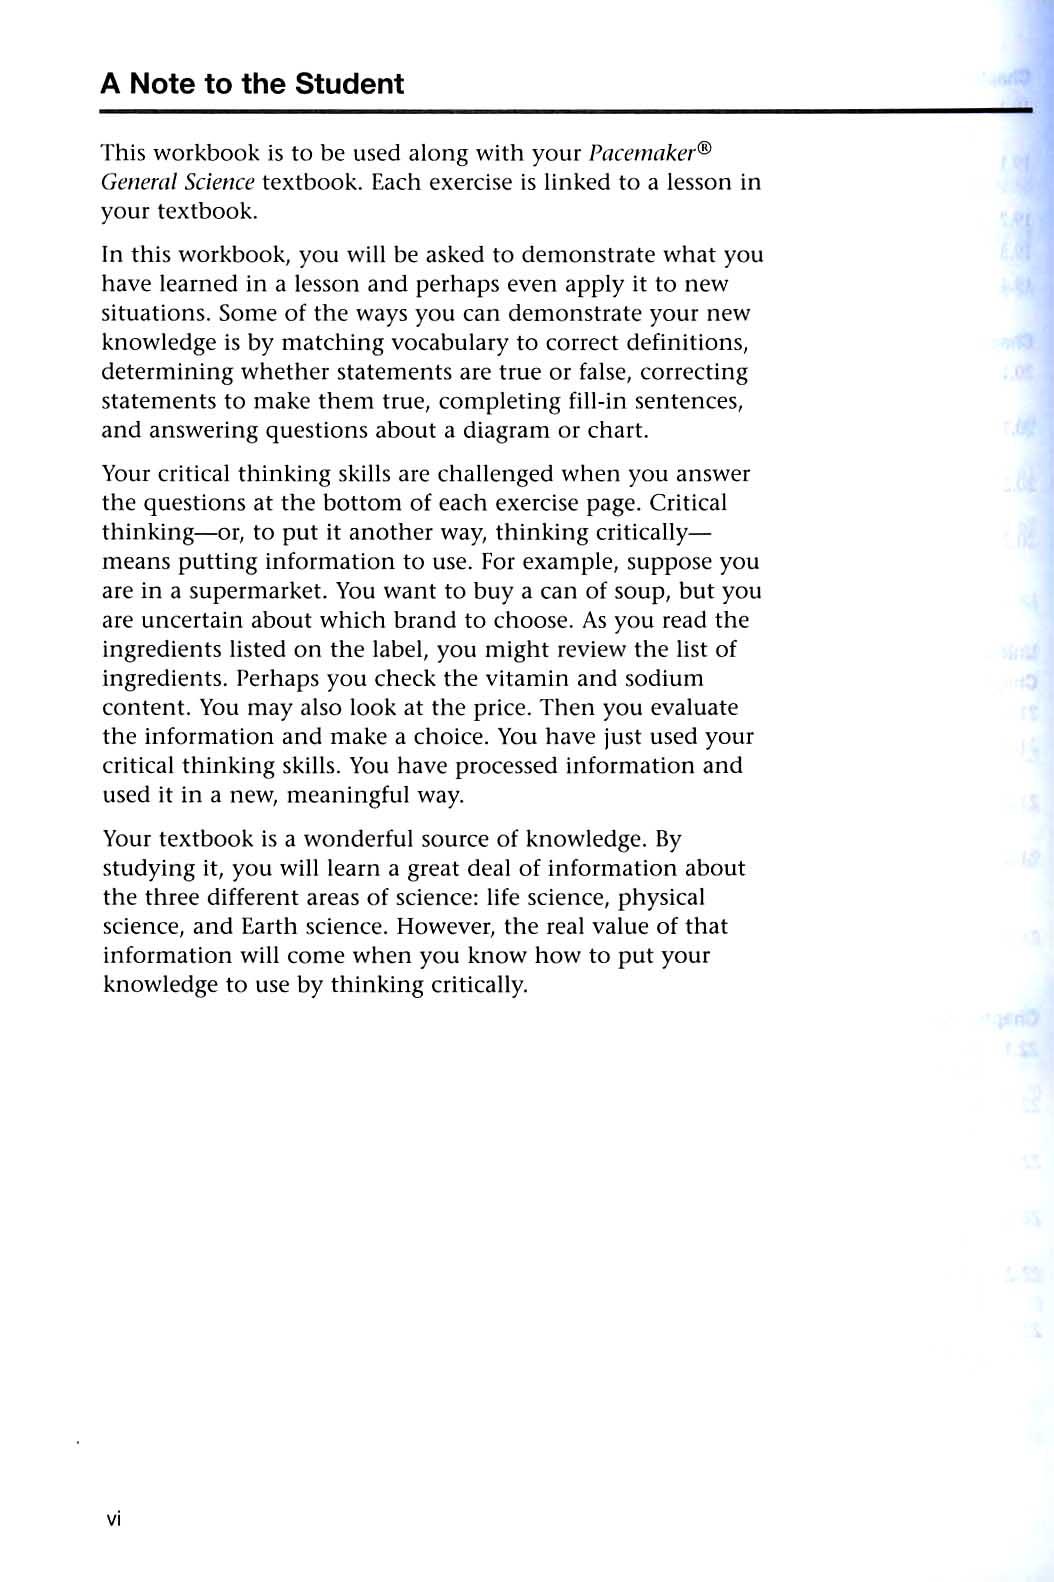 Pacemaker General Science Student Workbook